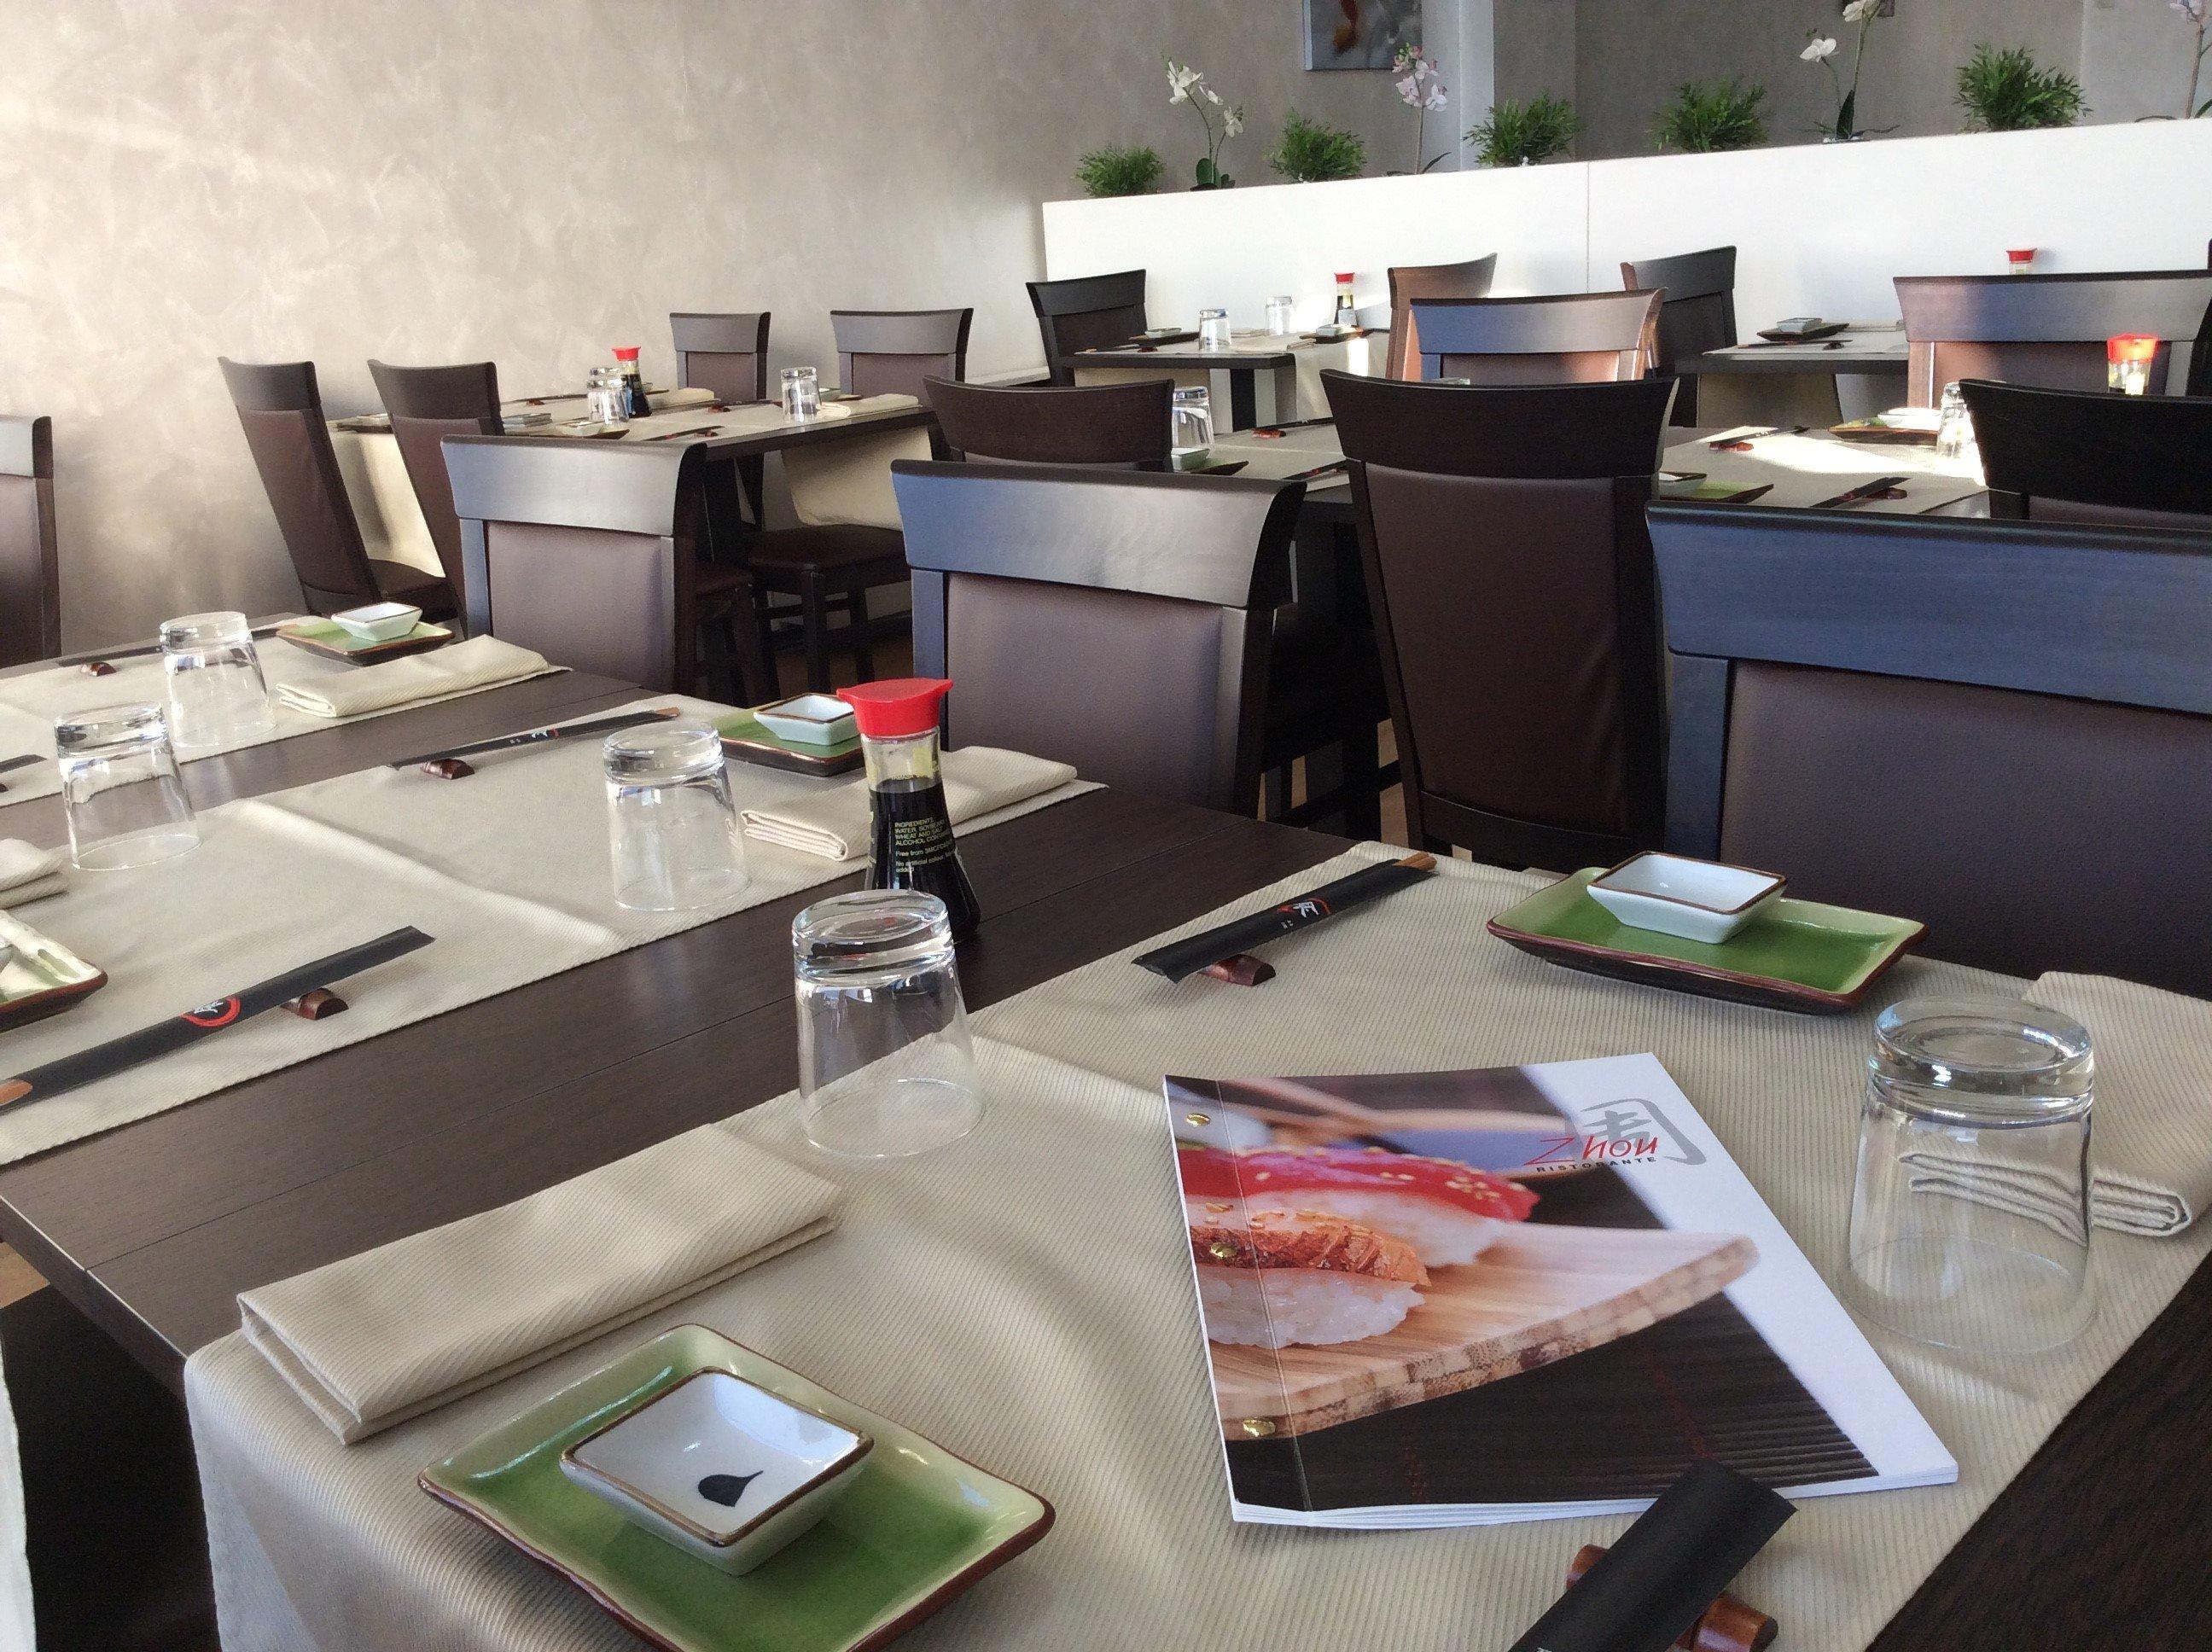 tavoli nel ristorante